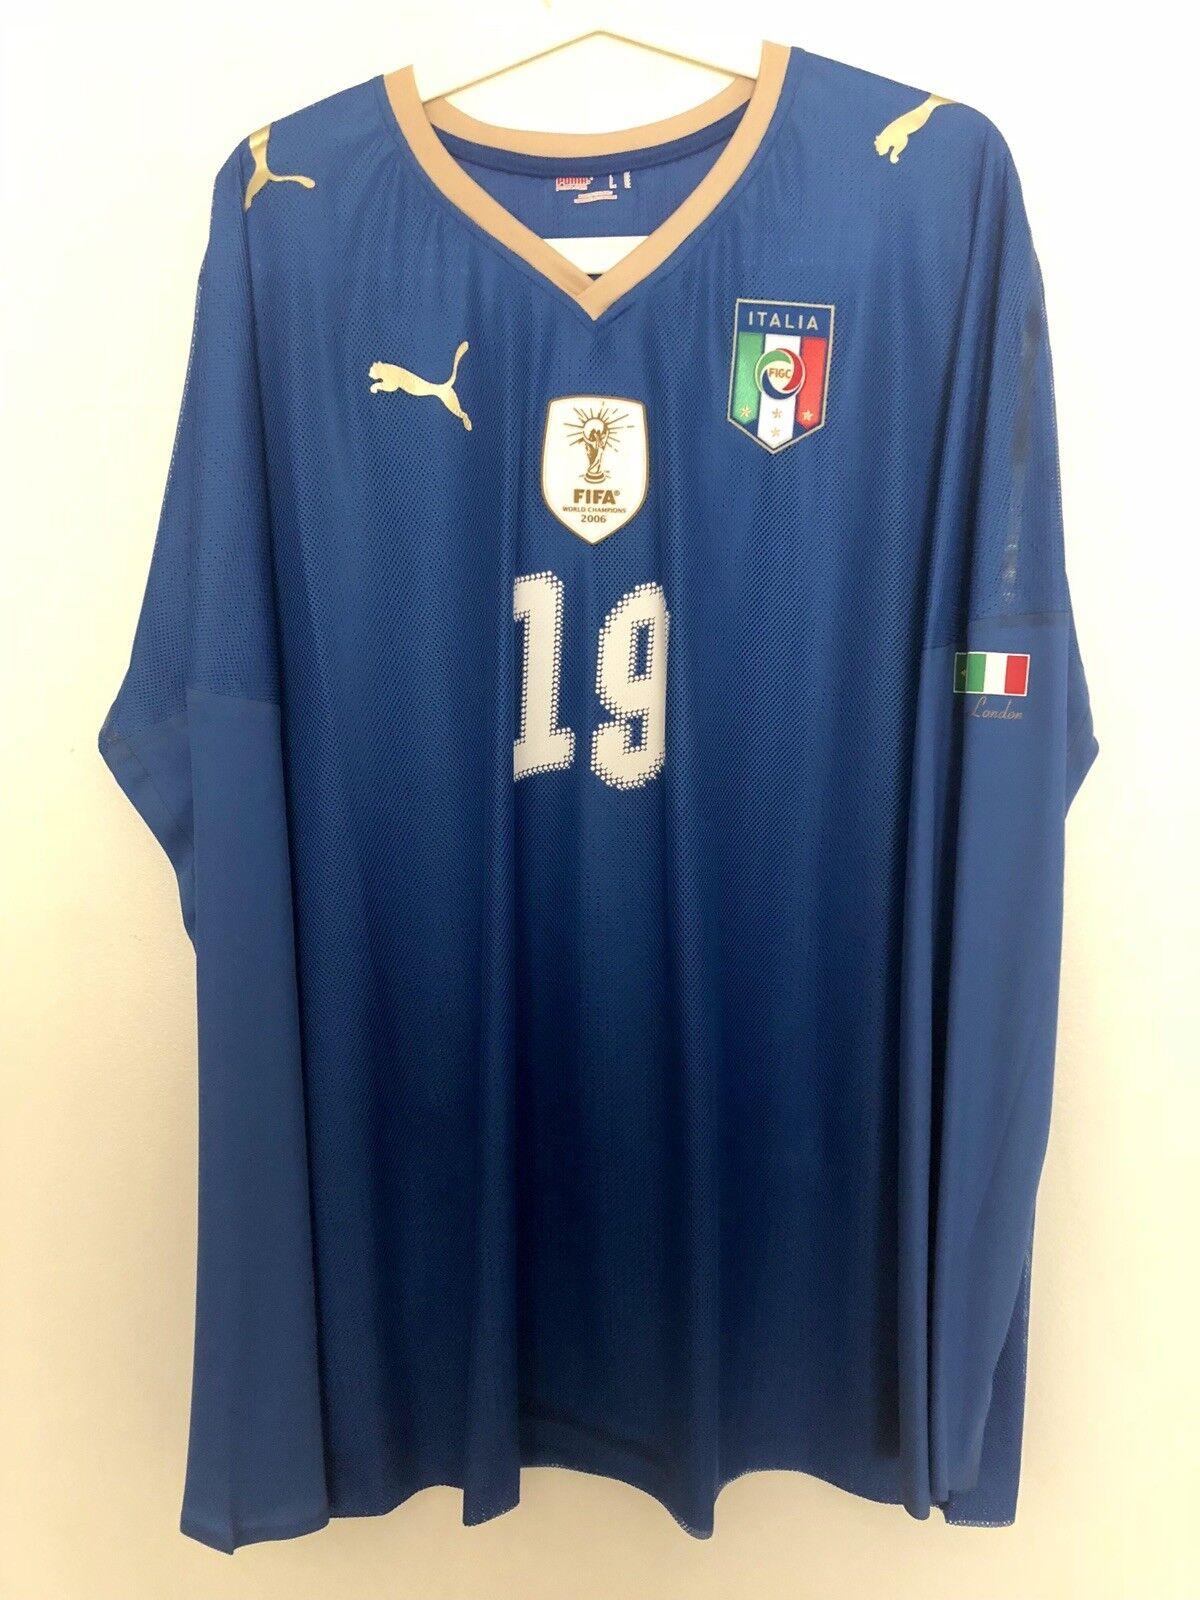 Reala Raul, 2009 Italia vs Brasil Match problema un Usado Camisa Raro Italia Maglia